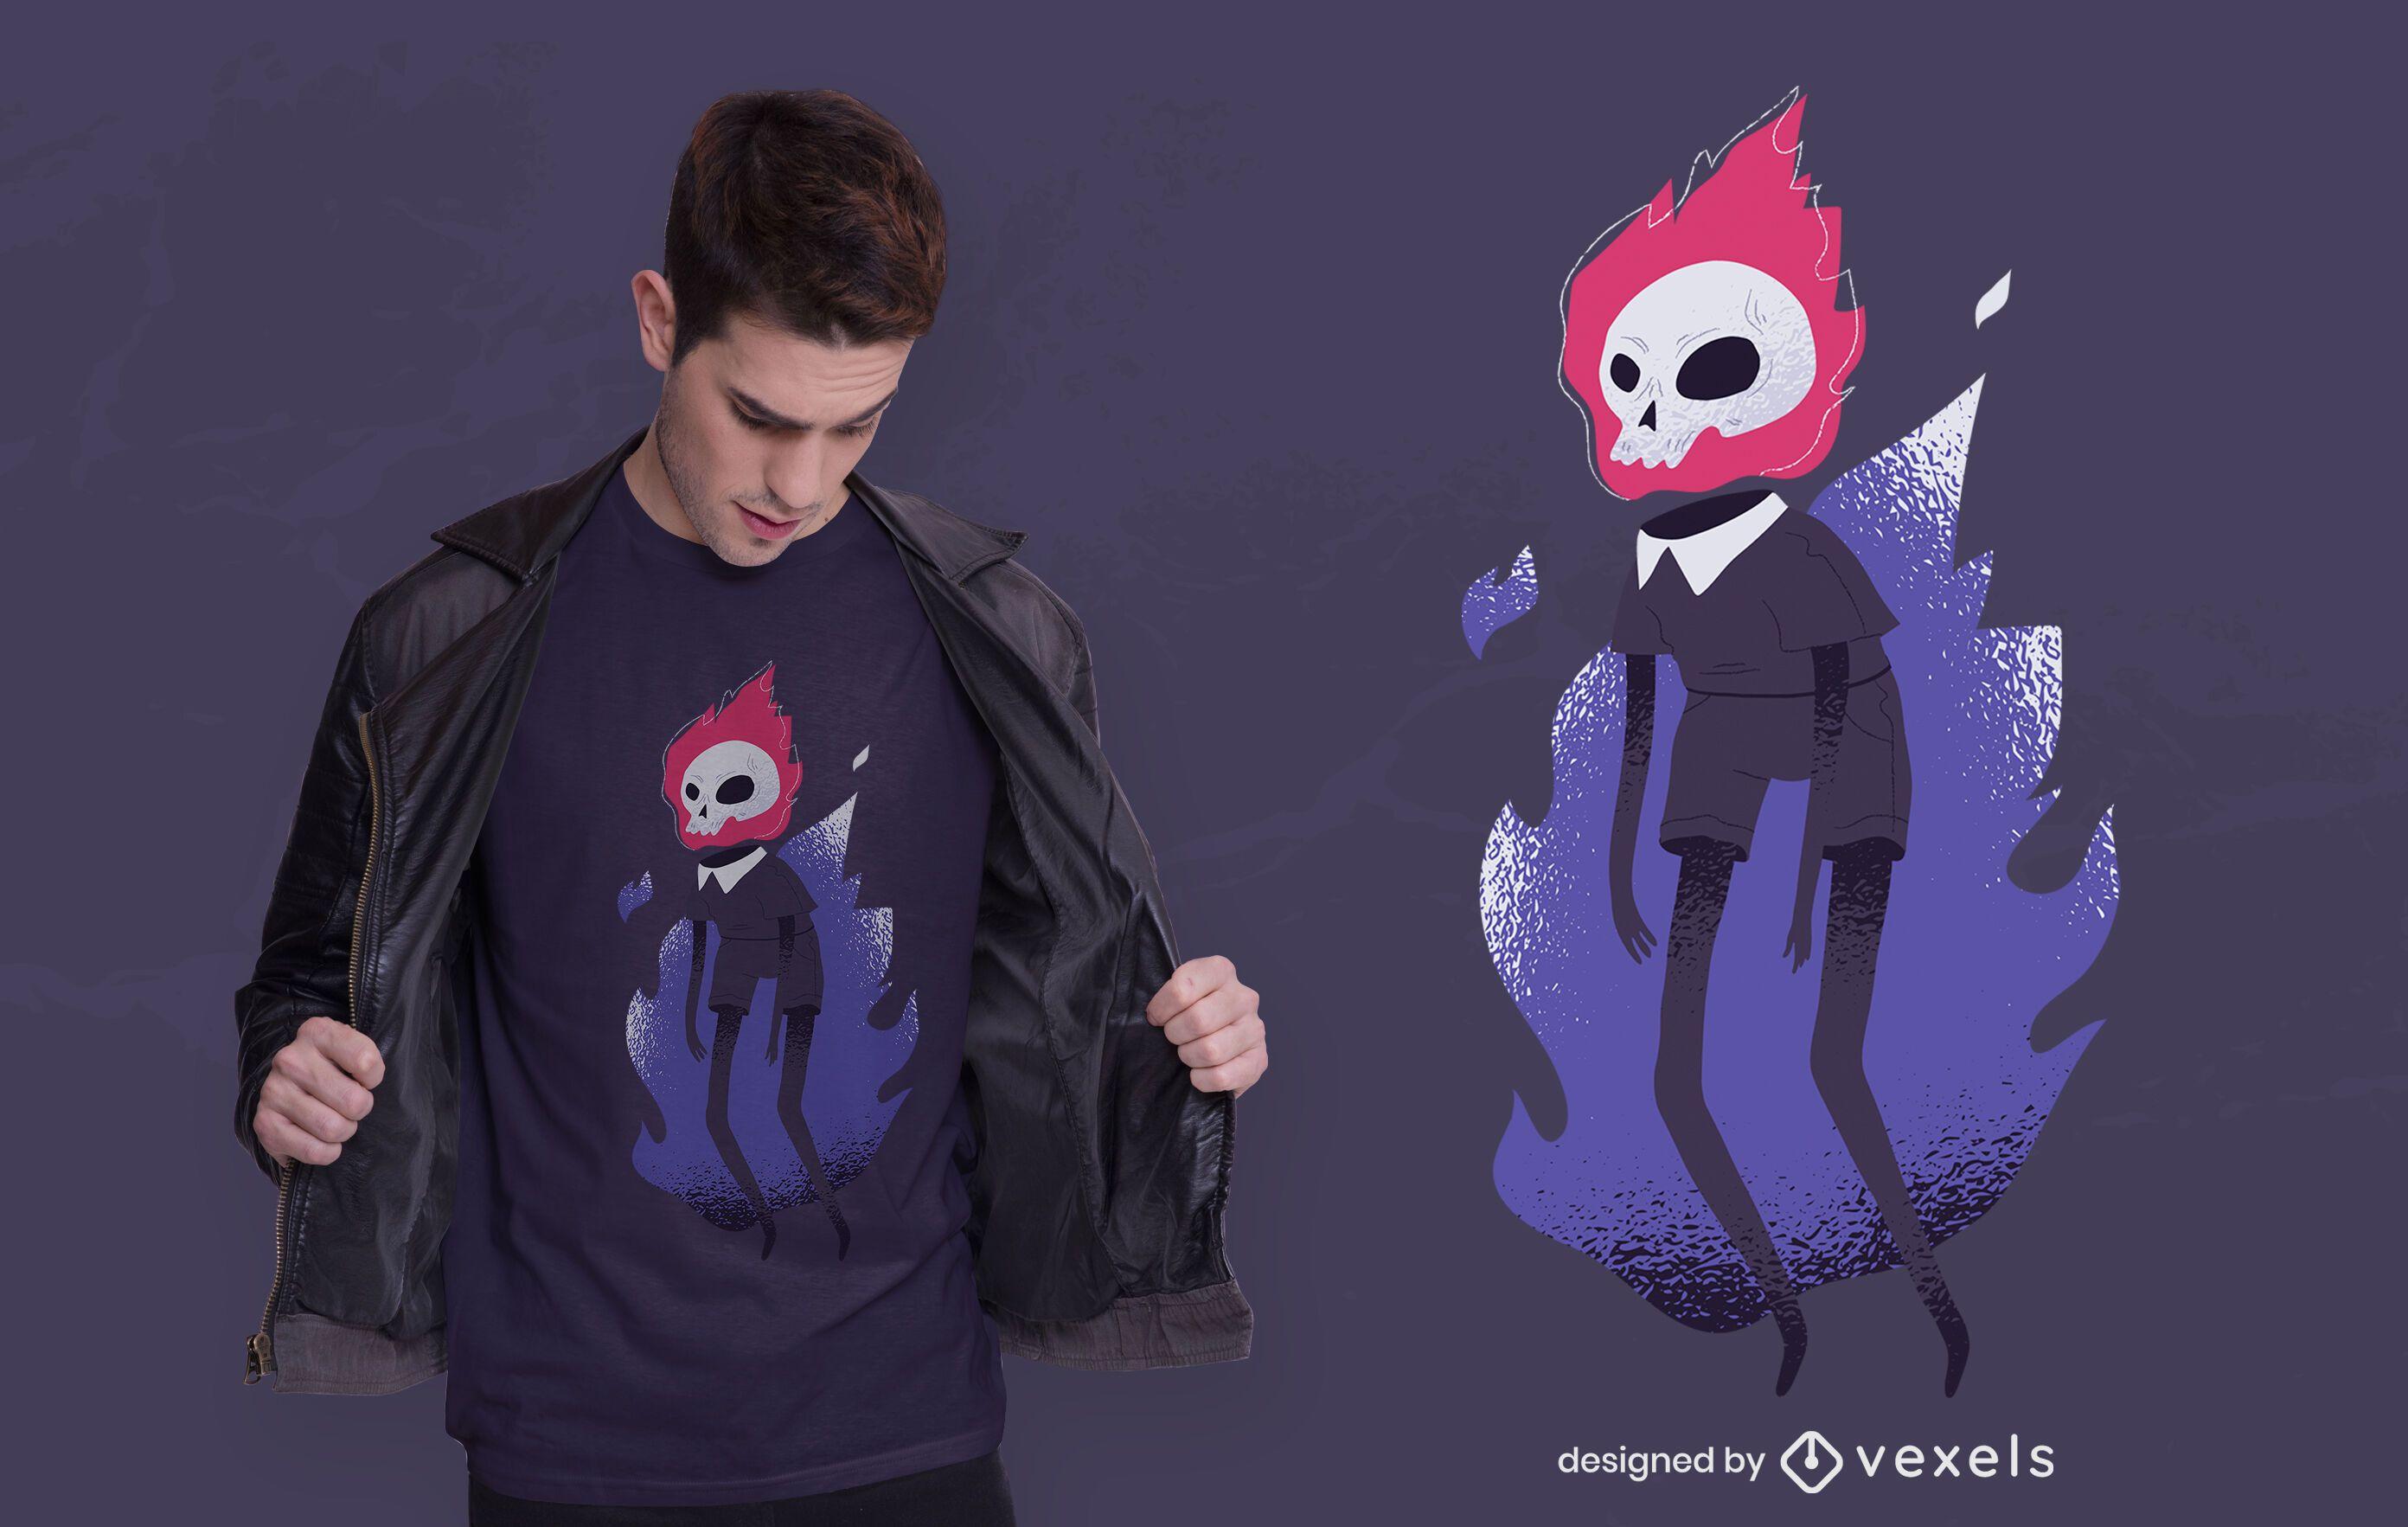 Halloween flaming skull t-shirt design